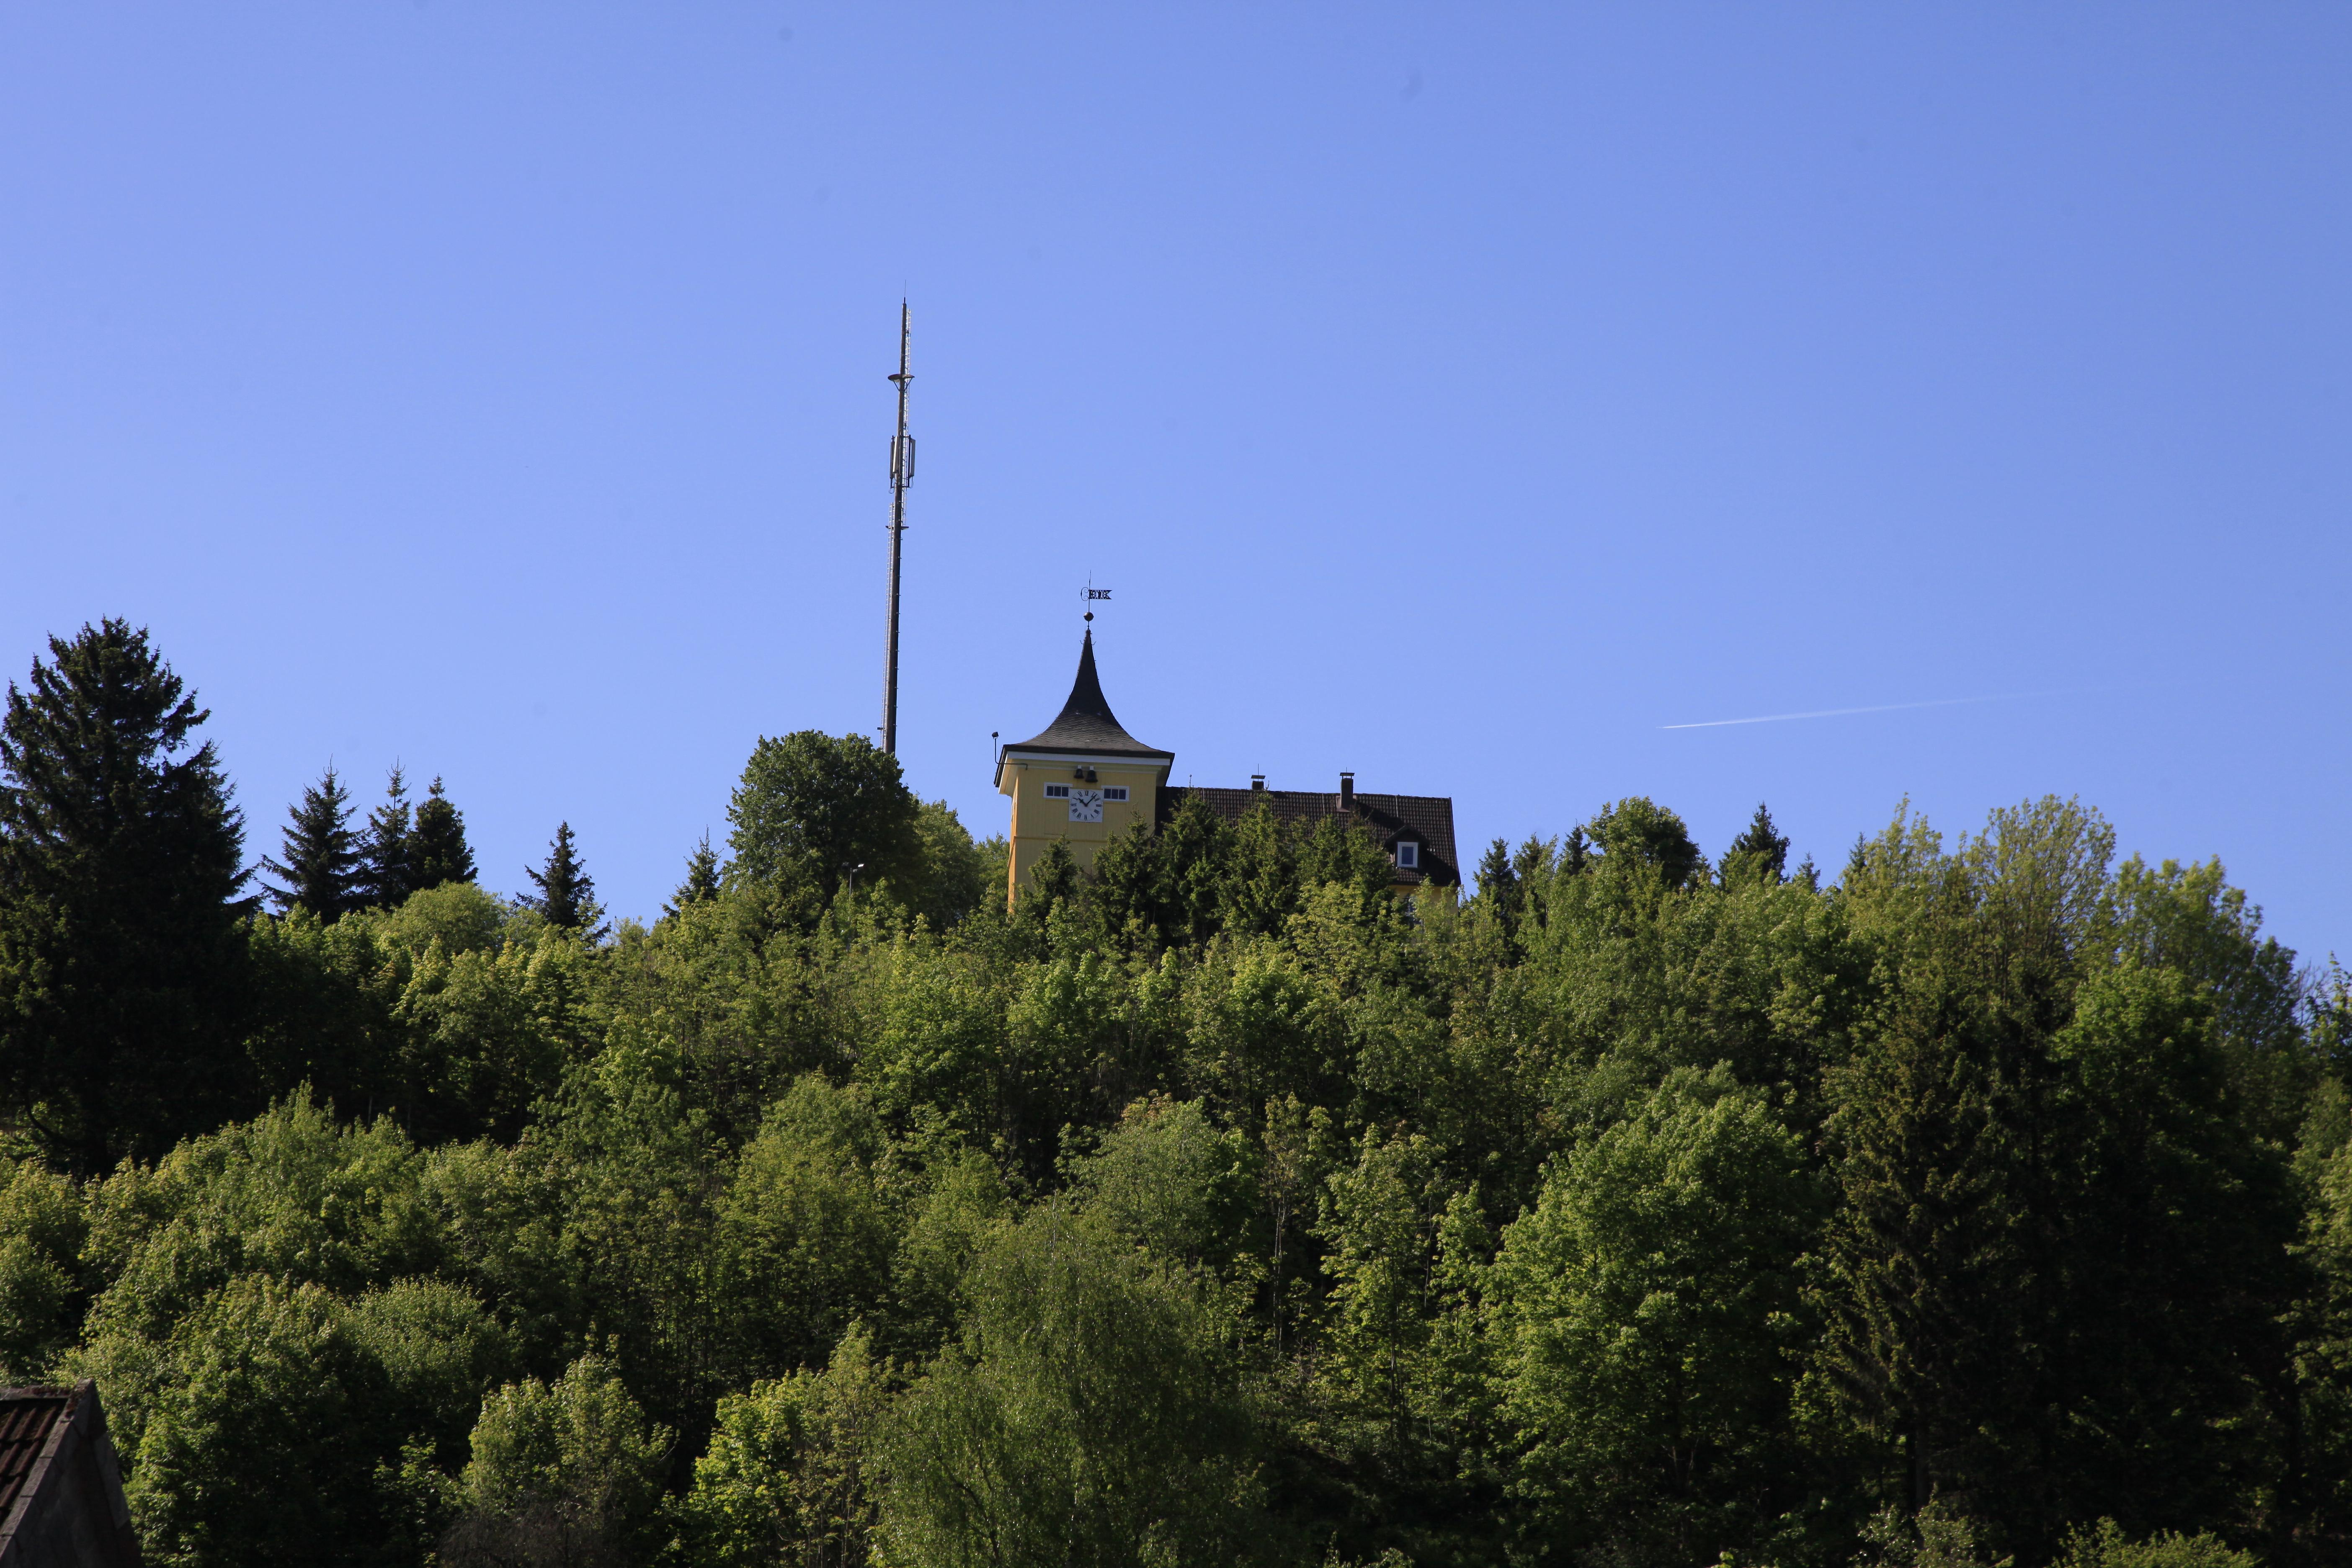 sankt-andreasberg-glockenturm(c)siegfried-richter.JPG